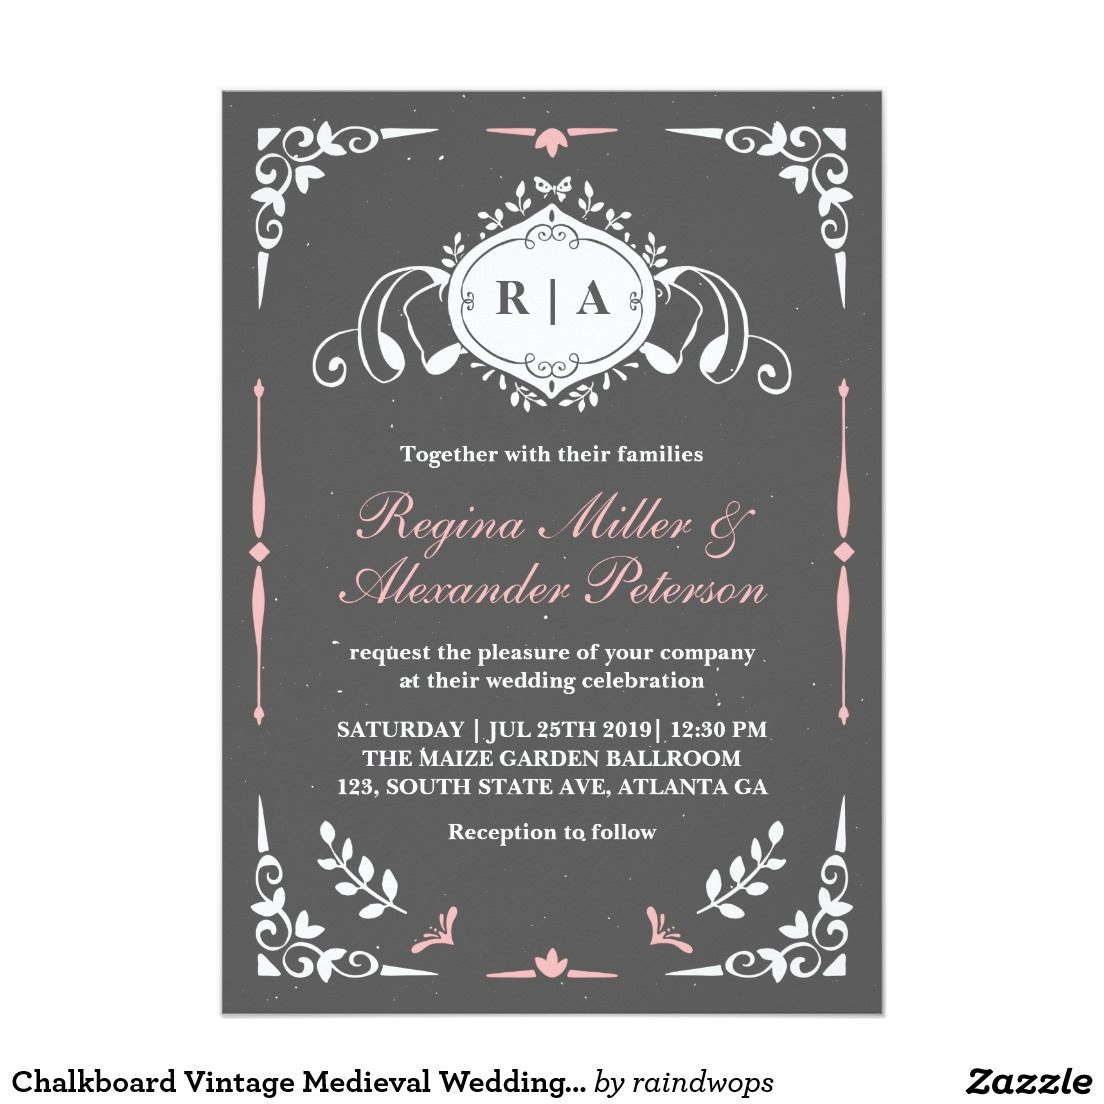 Chalkboard Vintage Medieval Wedding Invitation   Pinterest ...